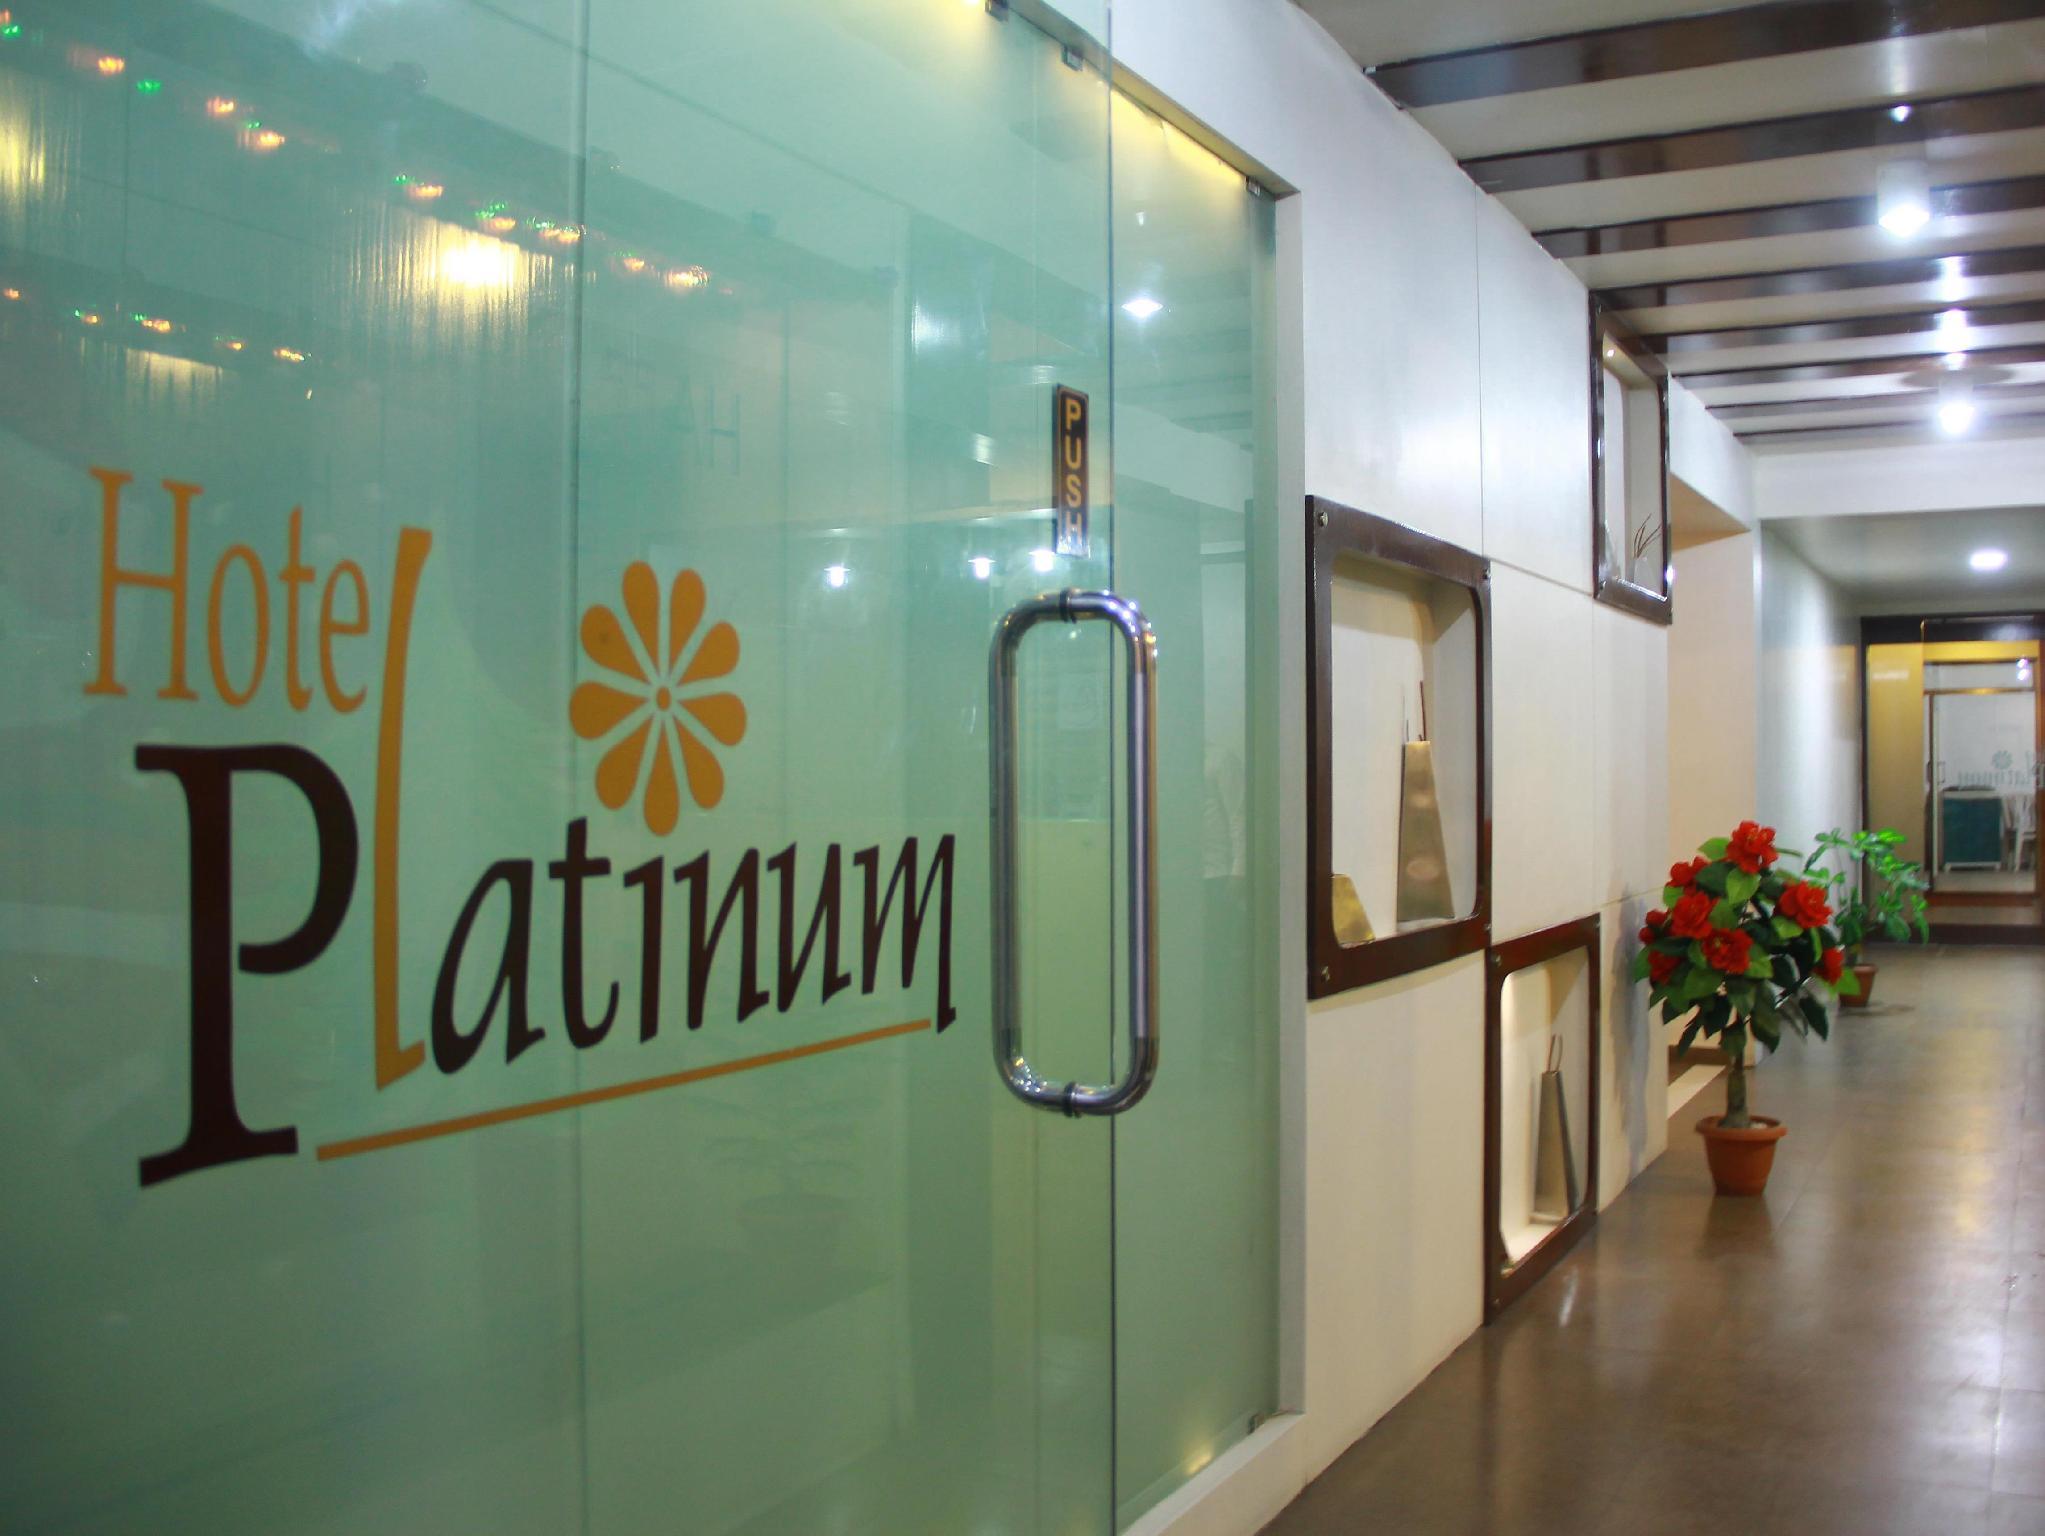 Hotel Platinum Junagadh